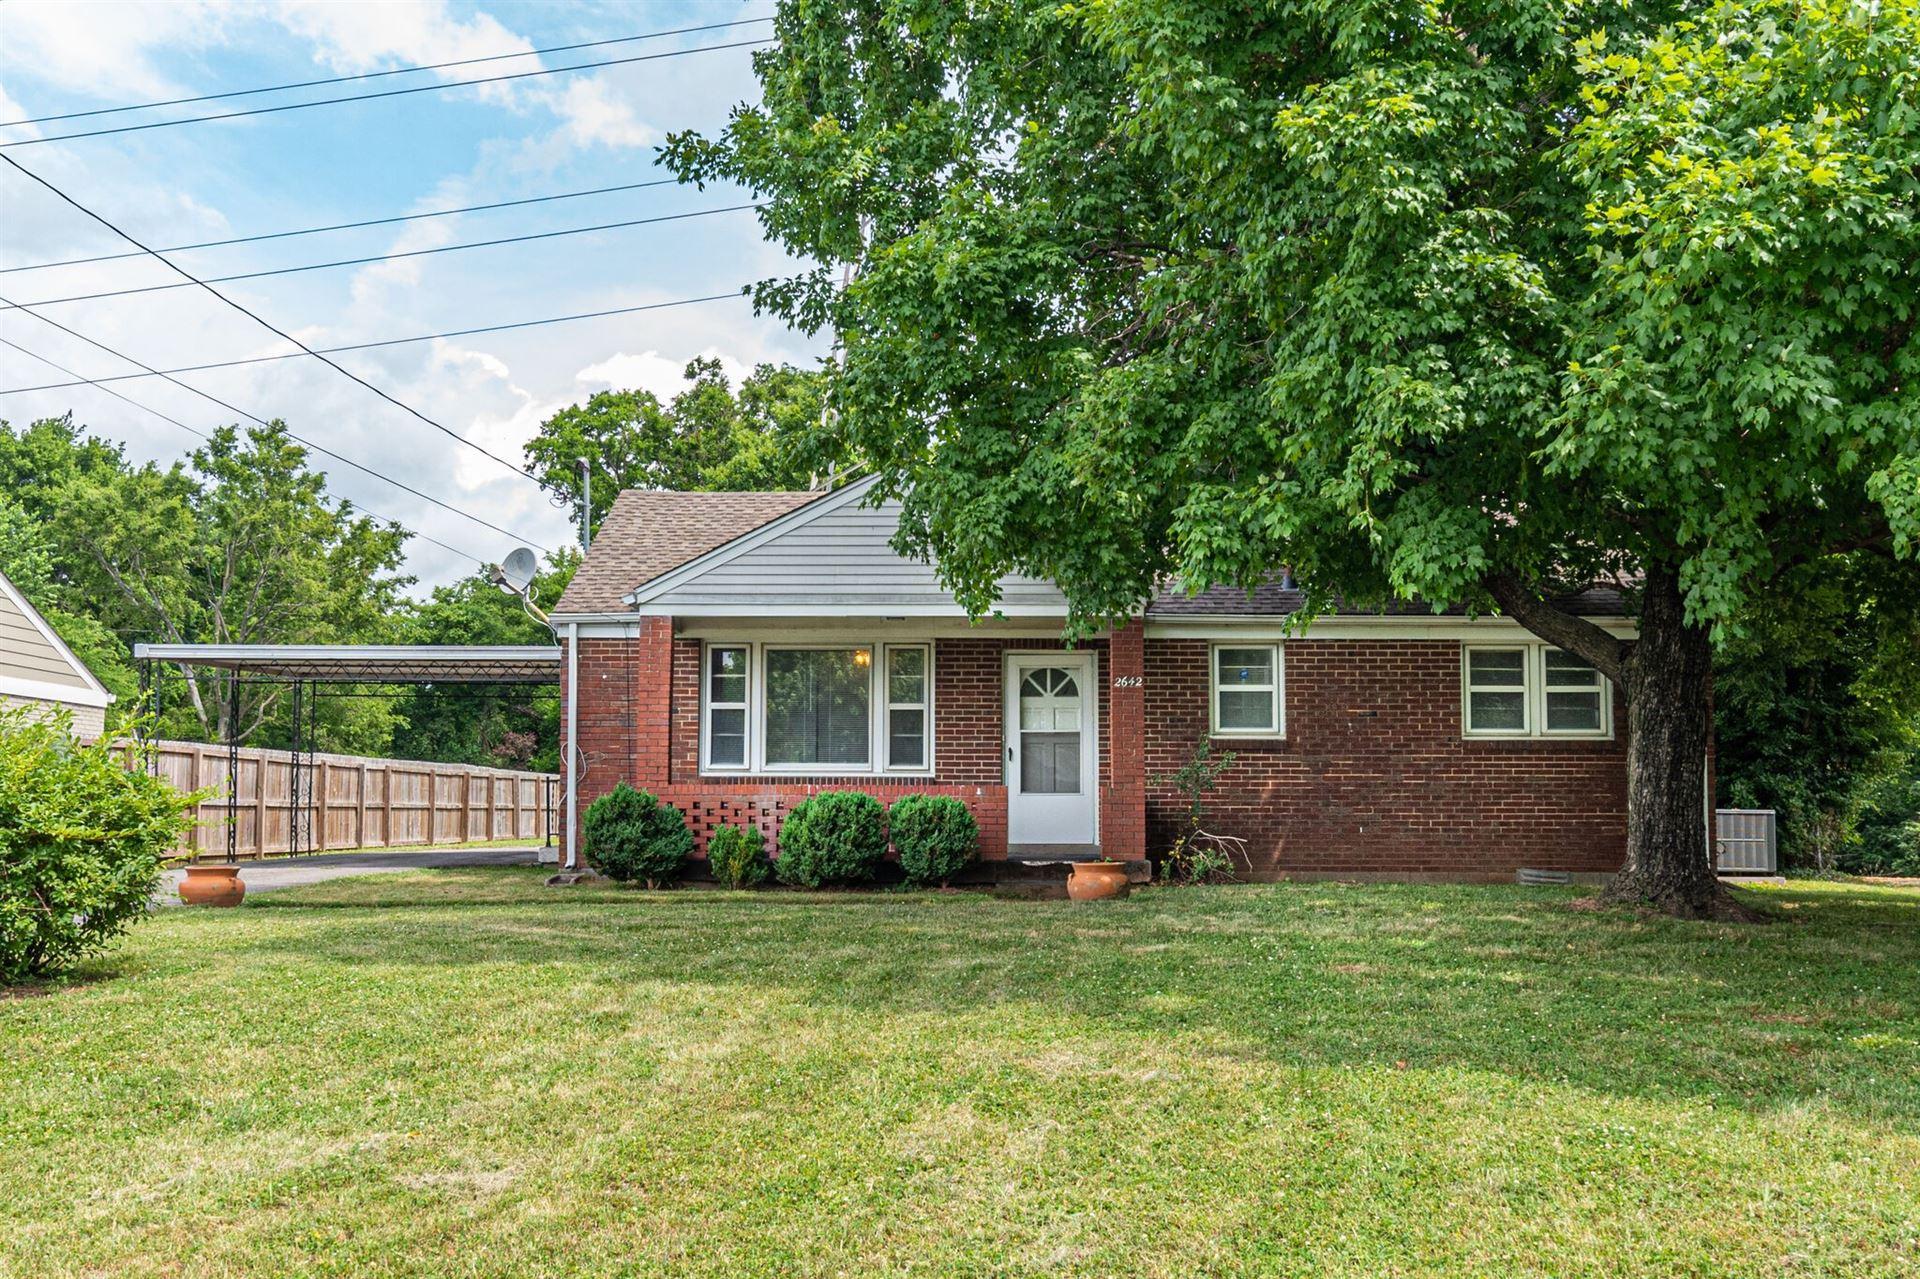 2642 Woodberry Dr, Nashville, TN 37214 - MLS#: 2265515